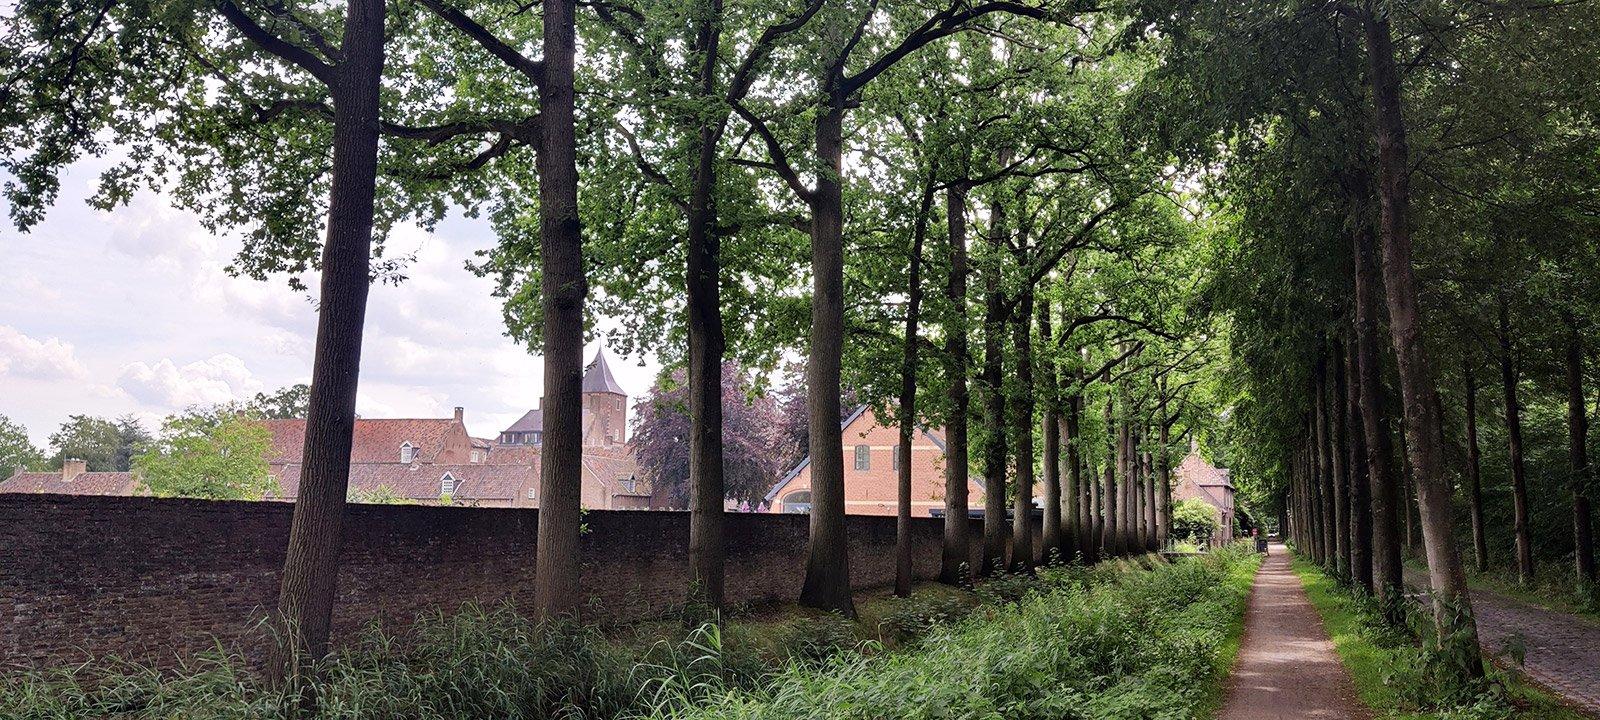 Biennale 2021 Oosterhout De Heilige Driehoek Klooster Catharinadal Zijaanzicht